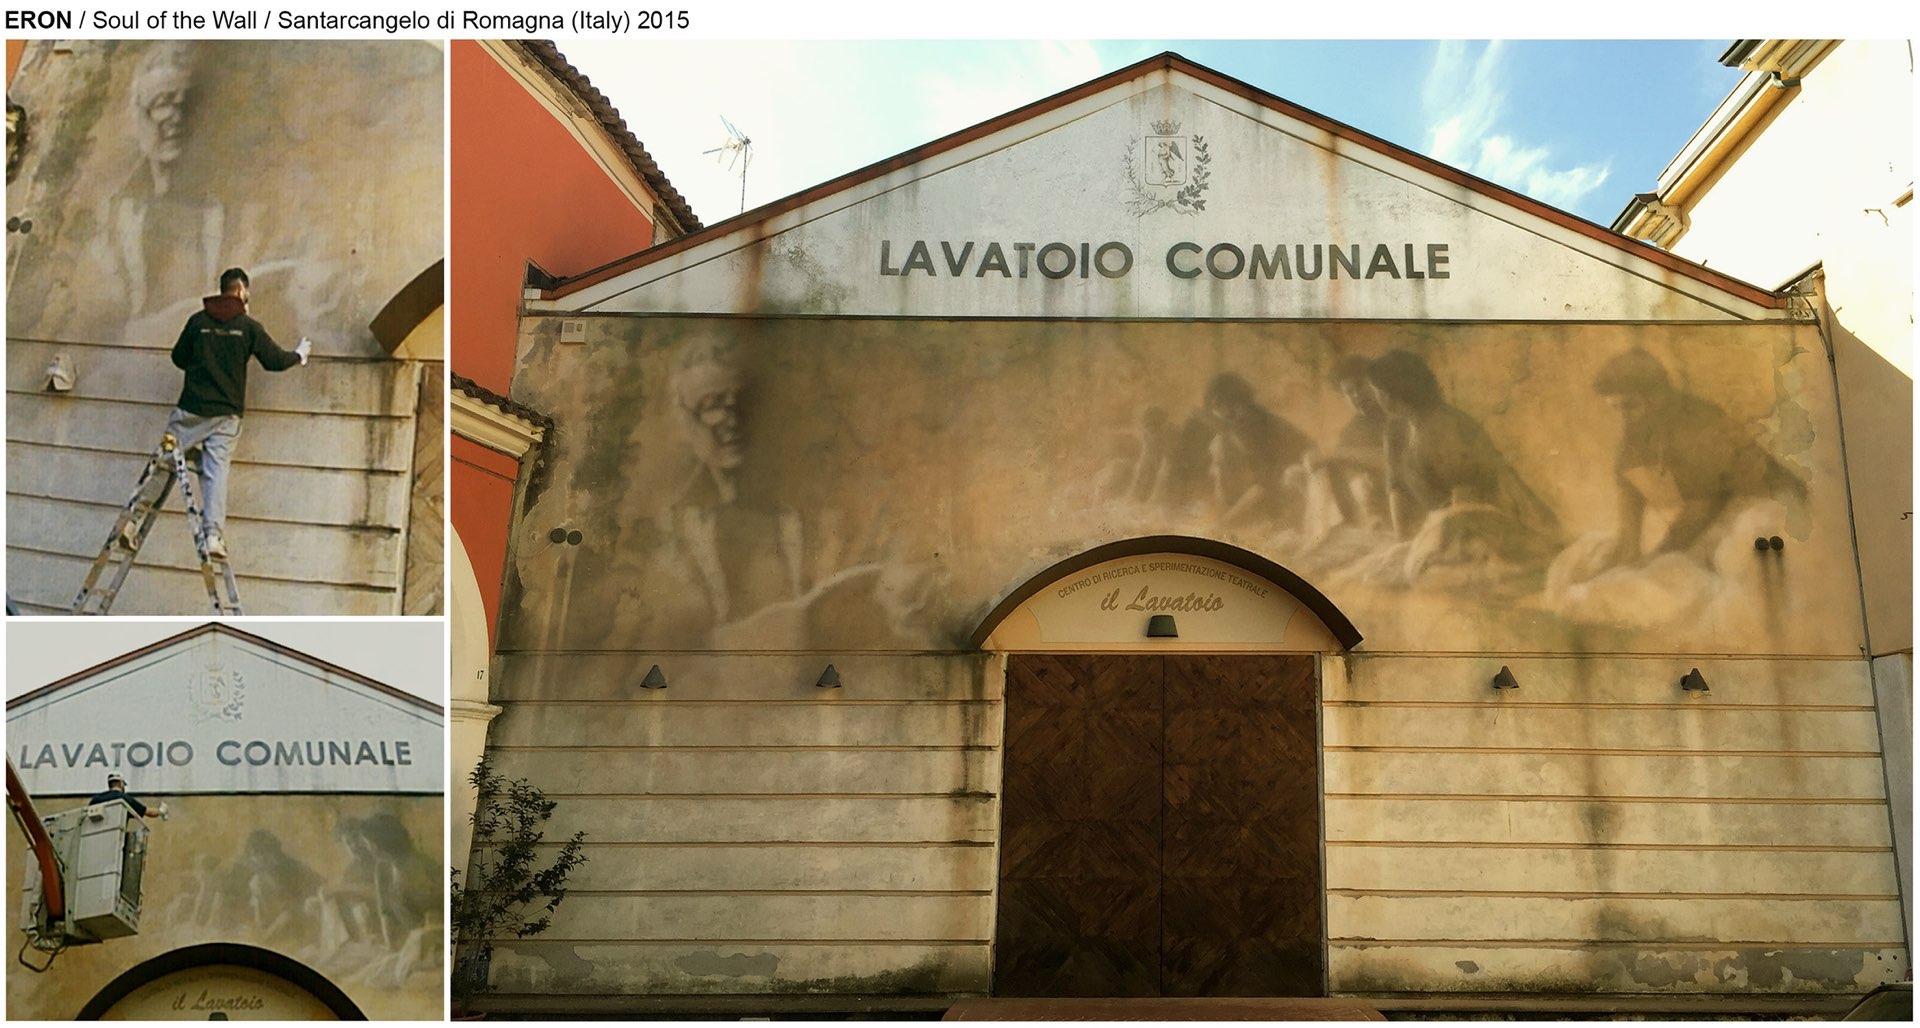 eron santarcangelo di Romagna distretto culturale valle camonica